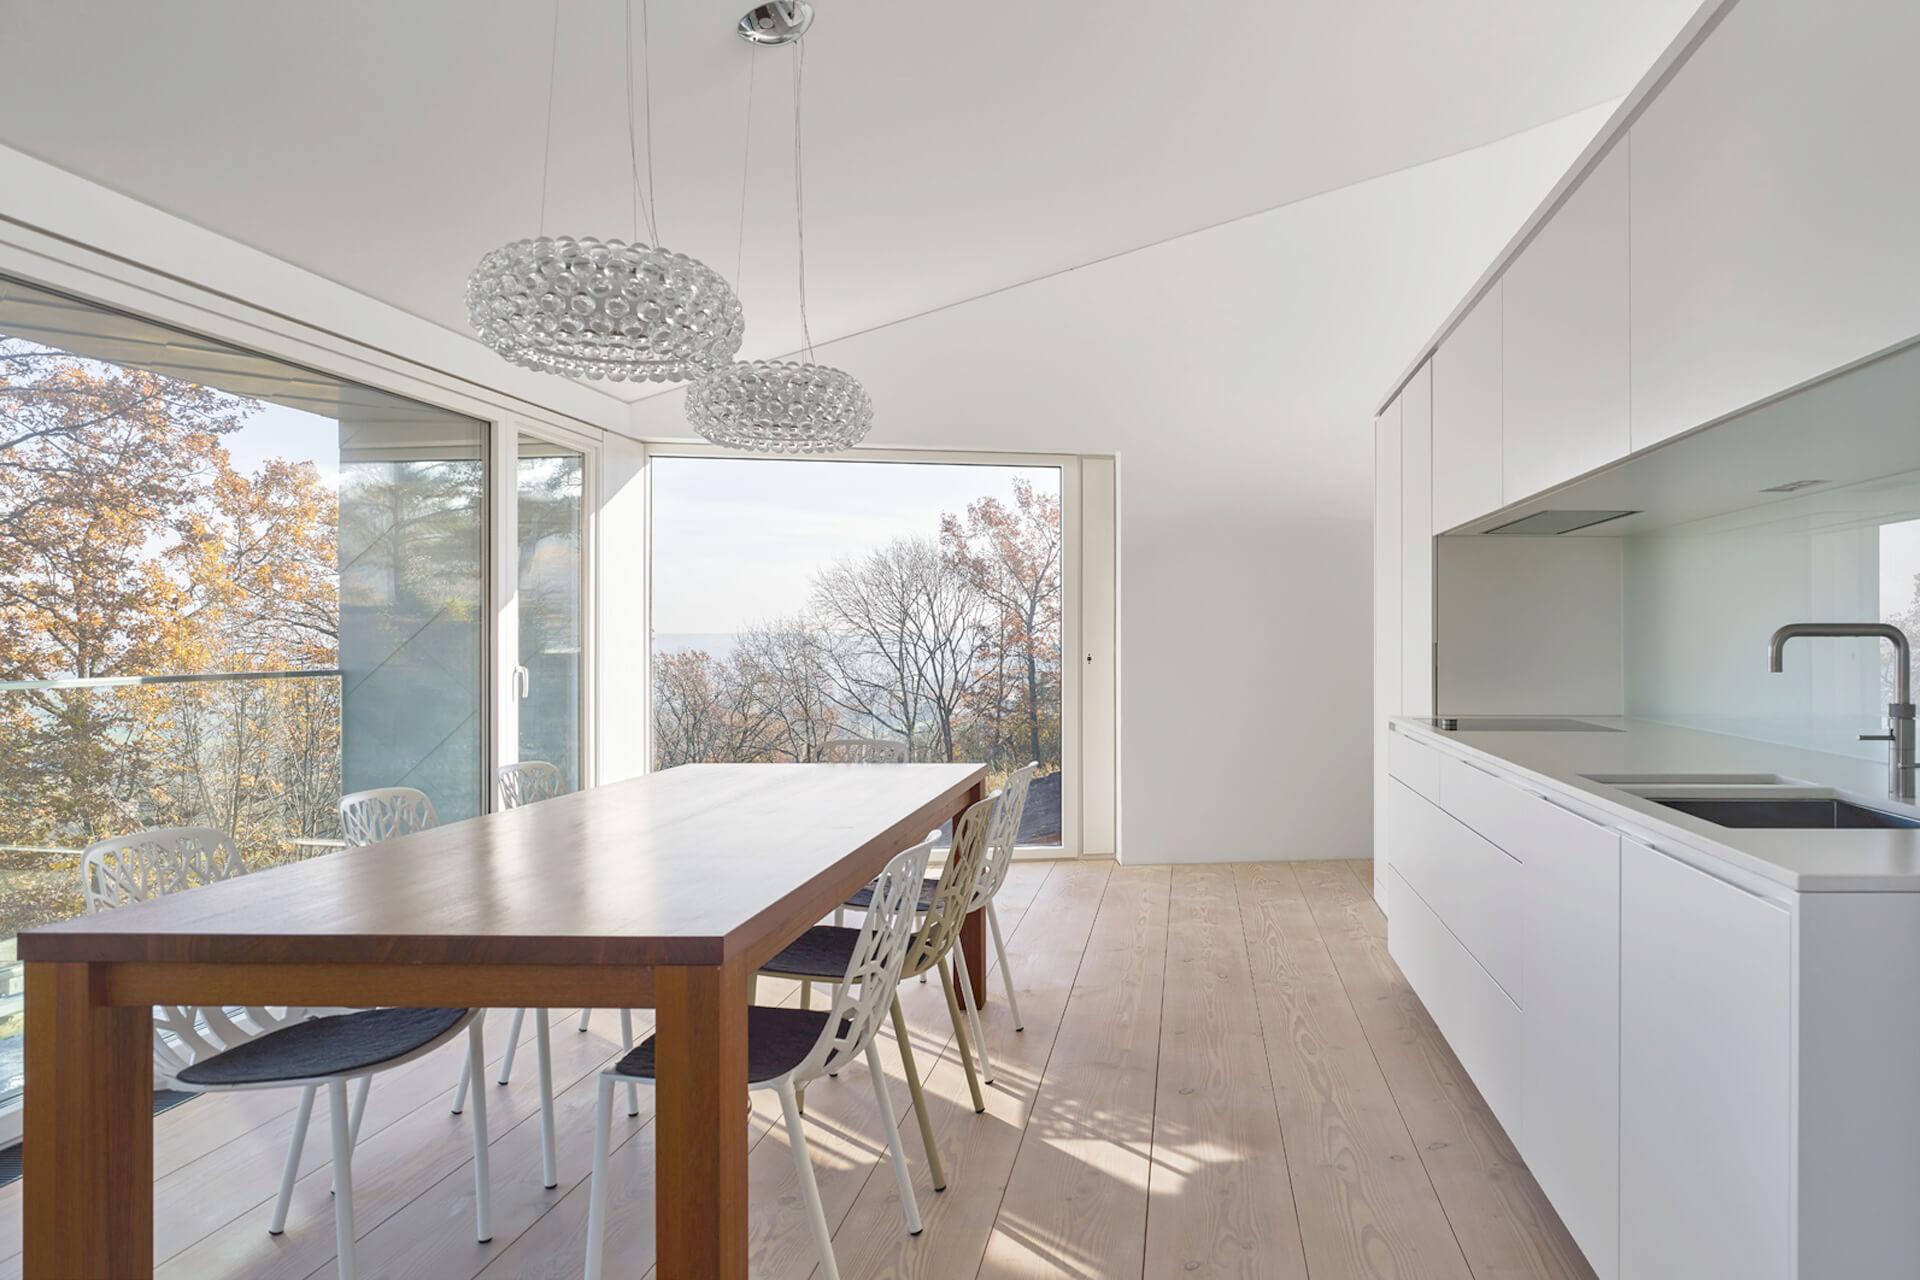 dielenb den douglasie dielen 200er serie pur natur. Black Bedroom Furniture Sets. Home Design Ideas